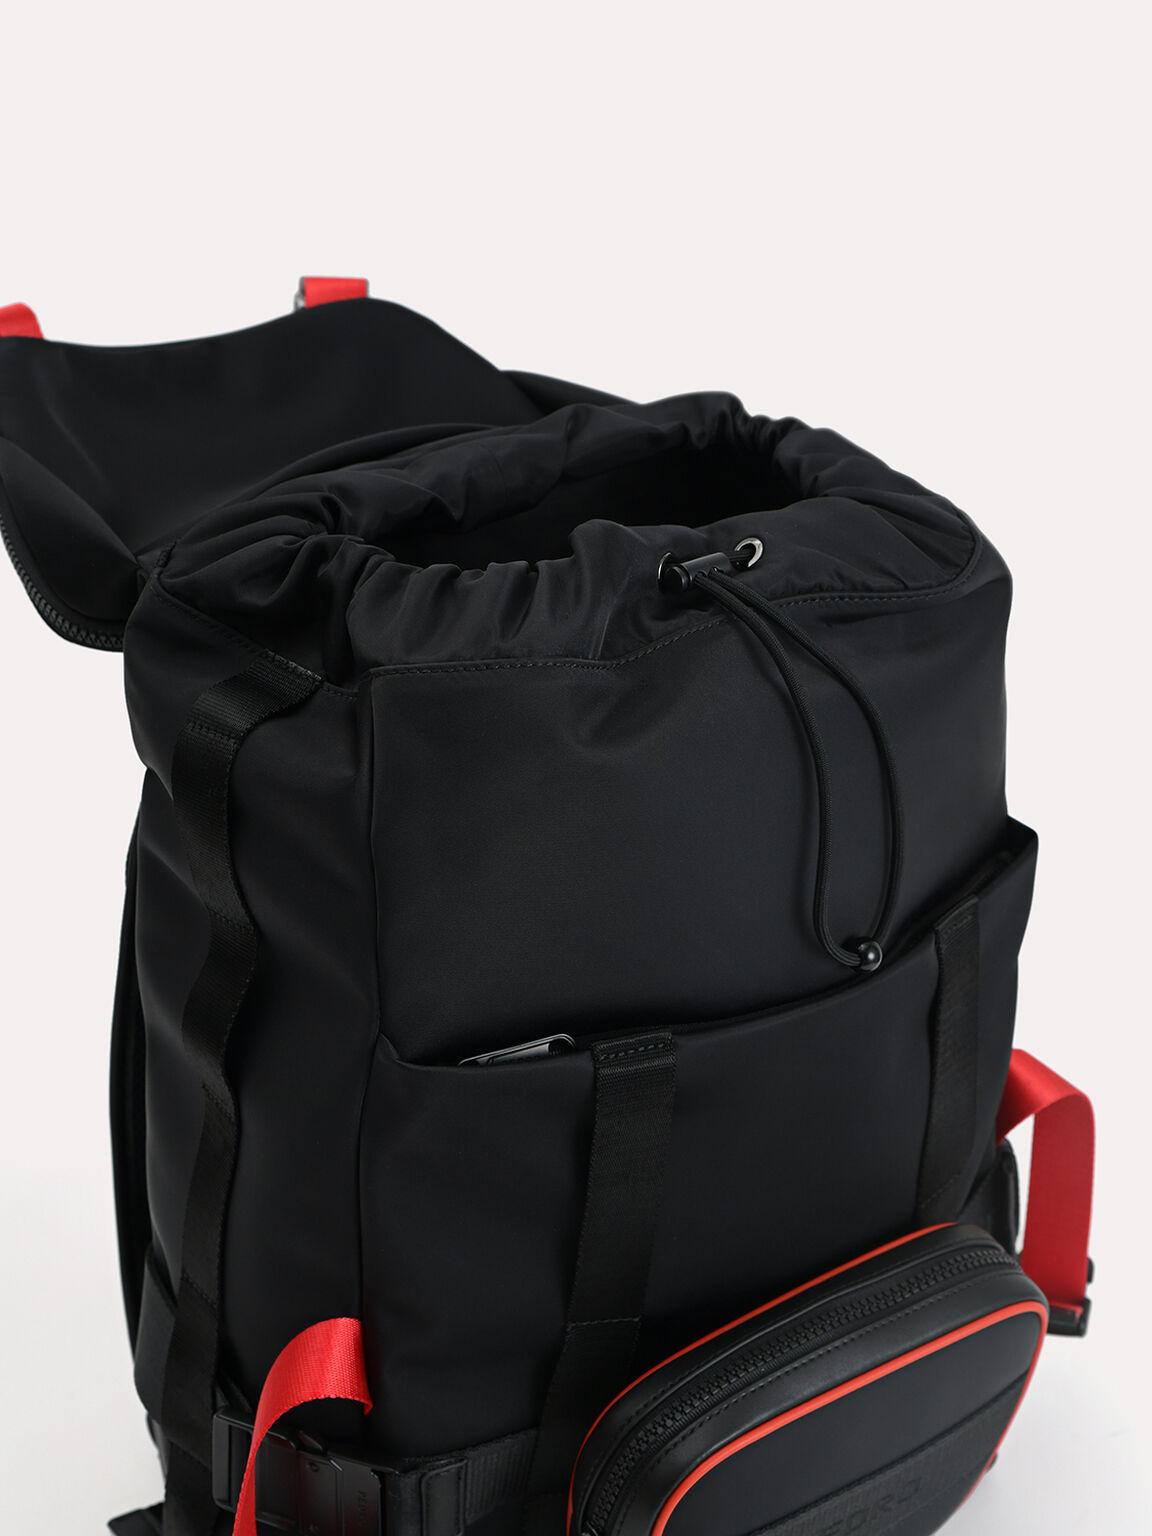 Nylon Backpack, Multi2, hi-res